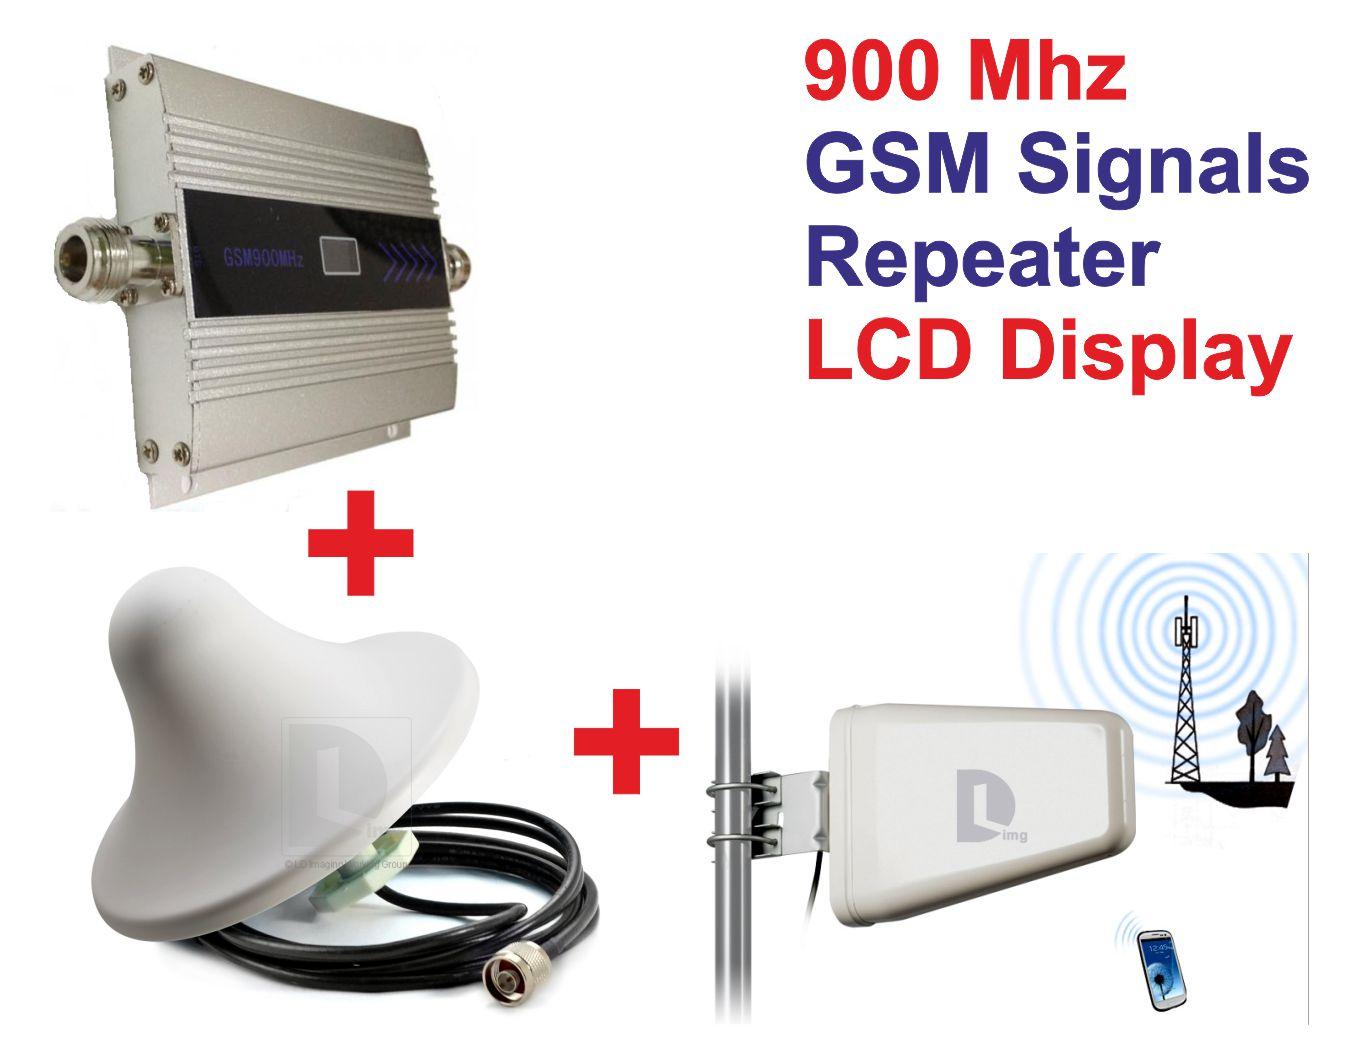 GSM репитер сигнала, Мини GSM 900 мГц мобильных усилитель сигнала, и небольшая антенна, мобильный телефон усилитель\\r\\n\\r\\nСпецификация:\\r\\n\\r\\n1) Частотный диапазон: До ссылка GSM 890-915\\r\\n\\r\\nDownlink GSM 925-960\\r\\n\\r\\n2) Усиление (дб) GSM ссылку: 55\\r\\n\\r\\n3) GSM downlink: 60\\r\\n\\r\\n4) Усиление регулируемый диапазон: MGC ≥ 30dB\\r\\n\\r\\n5) Выходная мощность (дбм): ≥ 20\\r\\n\\r\\n6) Полоса пропускания пульсации gsm: дБ\\r\\n\\r\\n7) отказ группа: GSM (bw-60 дб) ≤42 МГц (bw-70дб) ≤45 МГц\\r\\n\\r\\n8) i/o сопротивление: 50/n разъем\\r\\n\\r\\n9) i/o возвратные потери: ≤-10db\\r\\n\\r\\n10) шум исунок: ≤-8db\\r\\n\\r\\n11) Интермодуляционные затухание (po = 13dbm): ≥ 40dBc\\r\\n\\r\\n12) задержка передачи: ≤0...